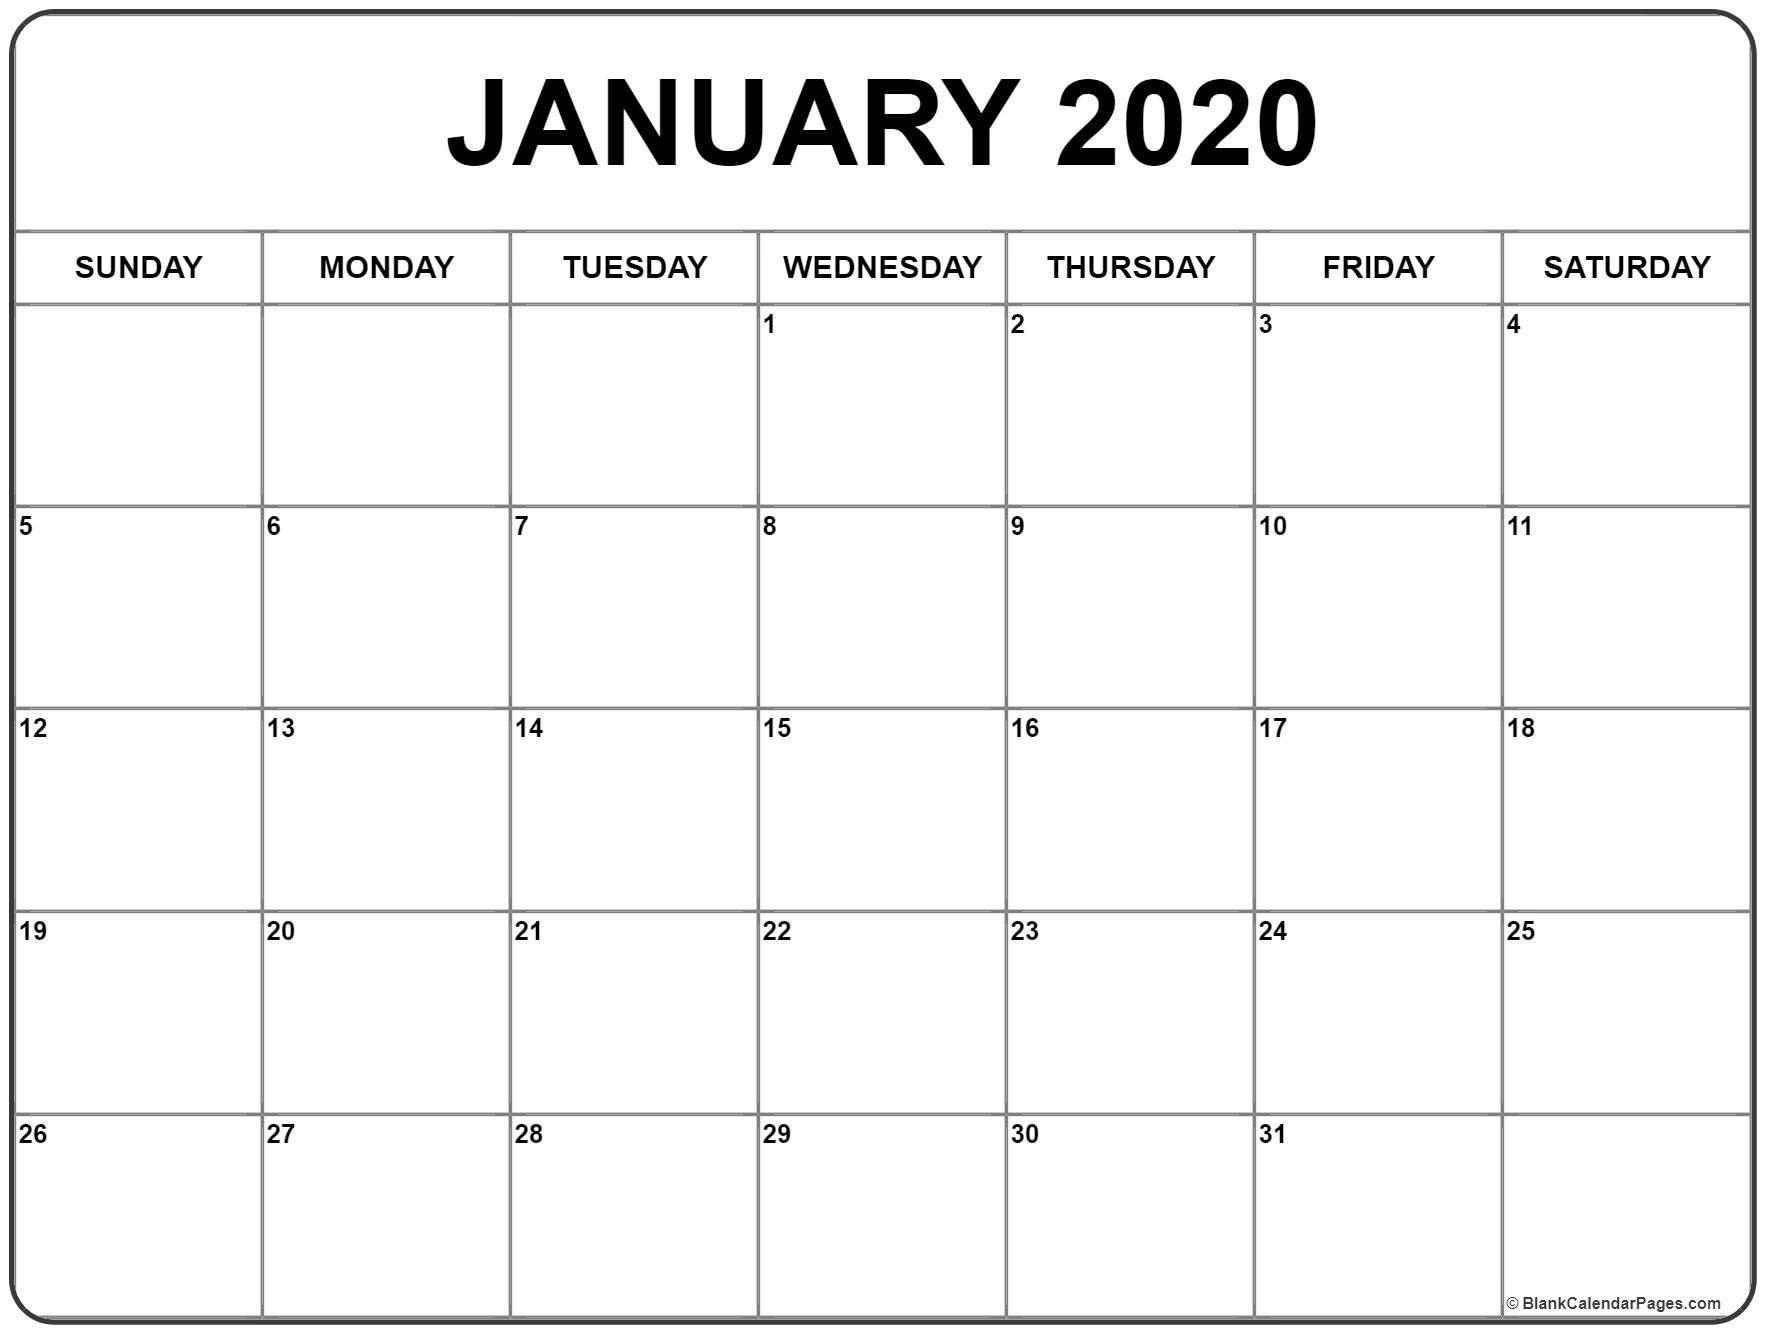 January 2020 Calendar 56 Templates Of 2020 Printable January 2020 Monthly Calendar Monday Start